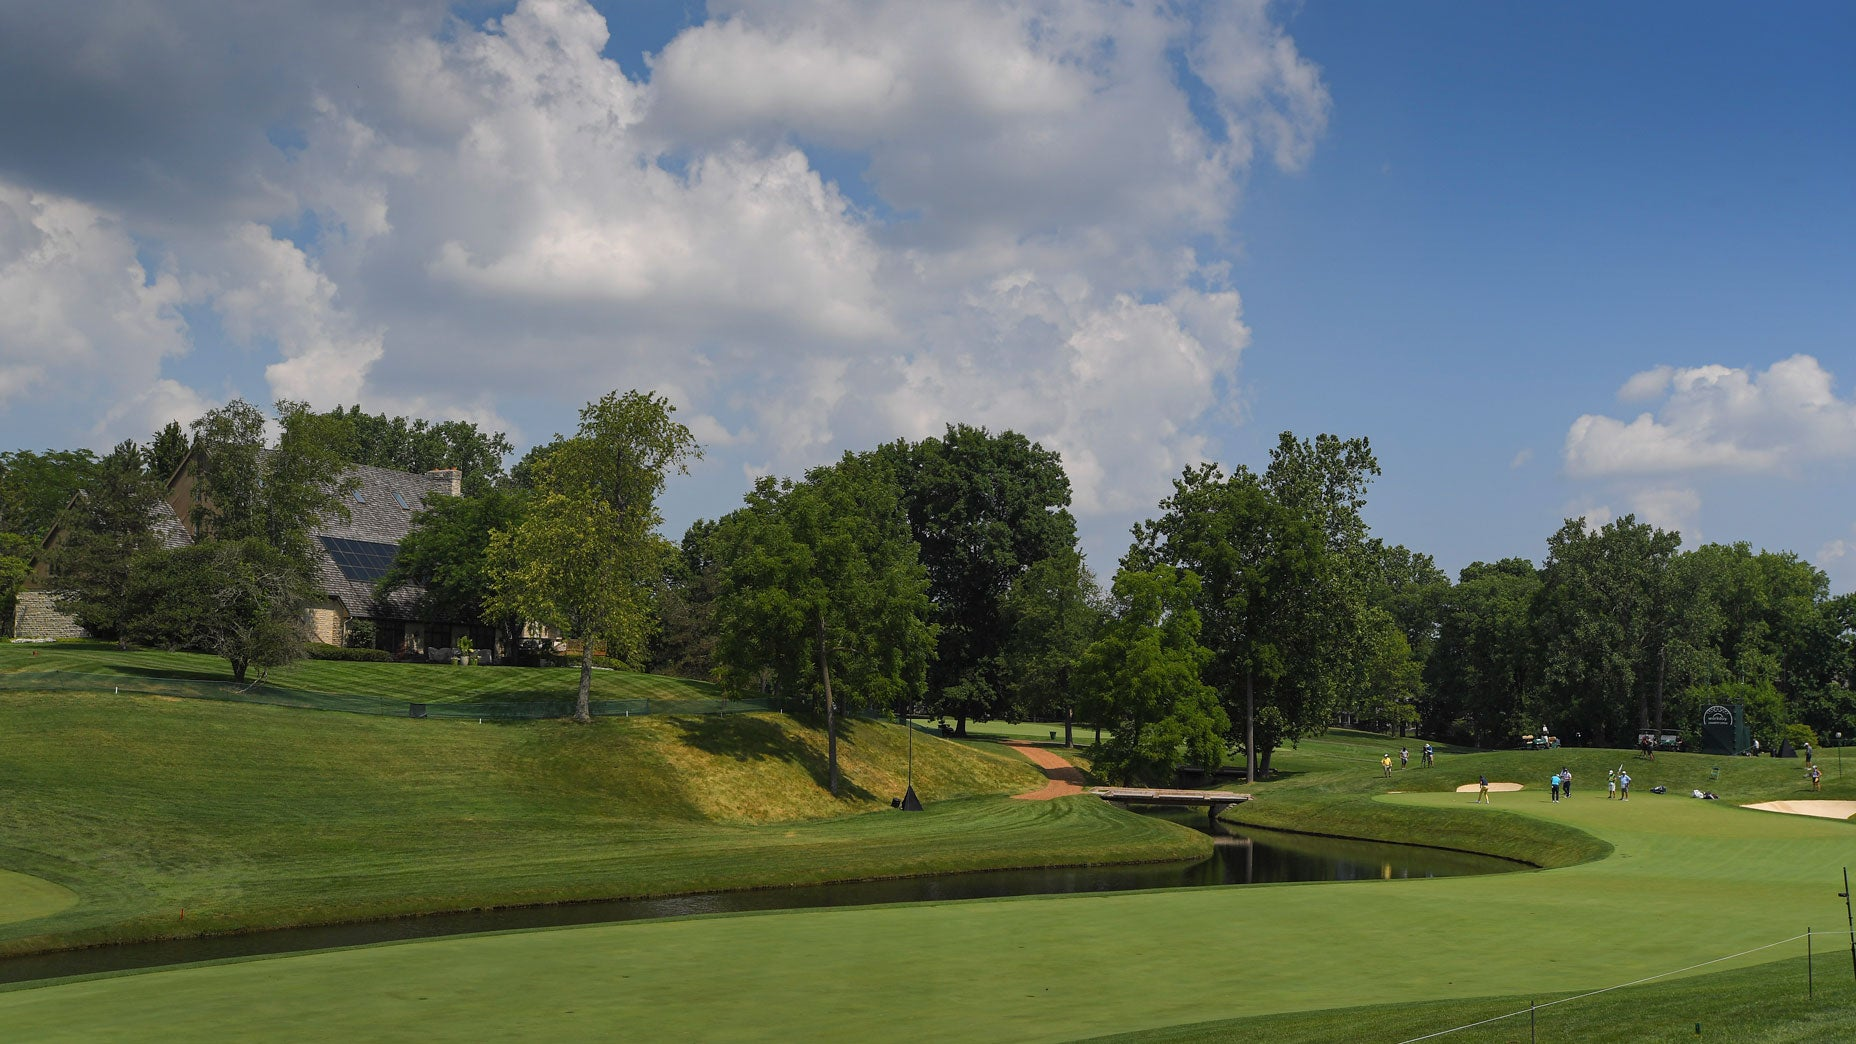 The par-5 5th hole at Muirfield Village Golf Club in 2020.